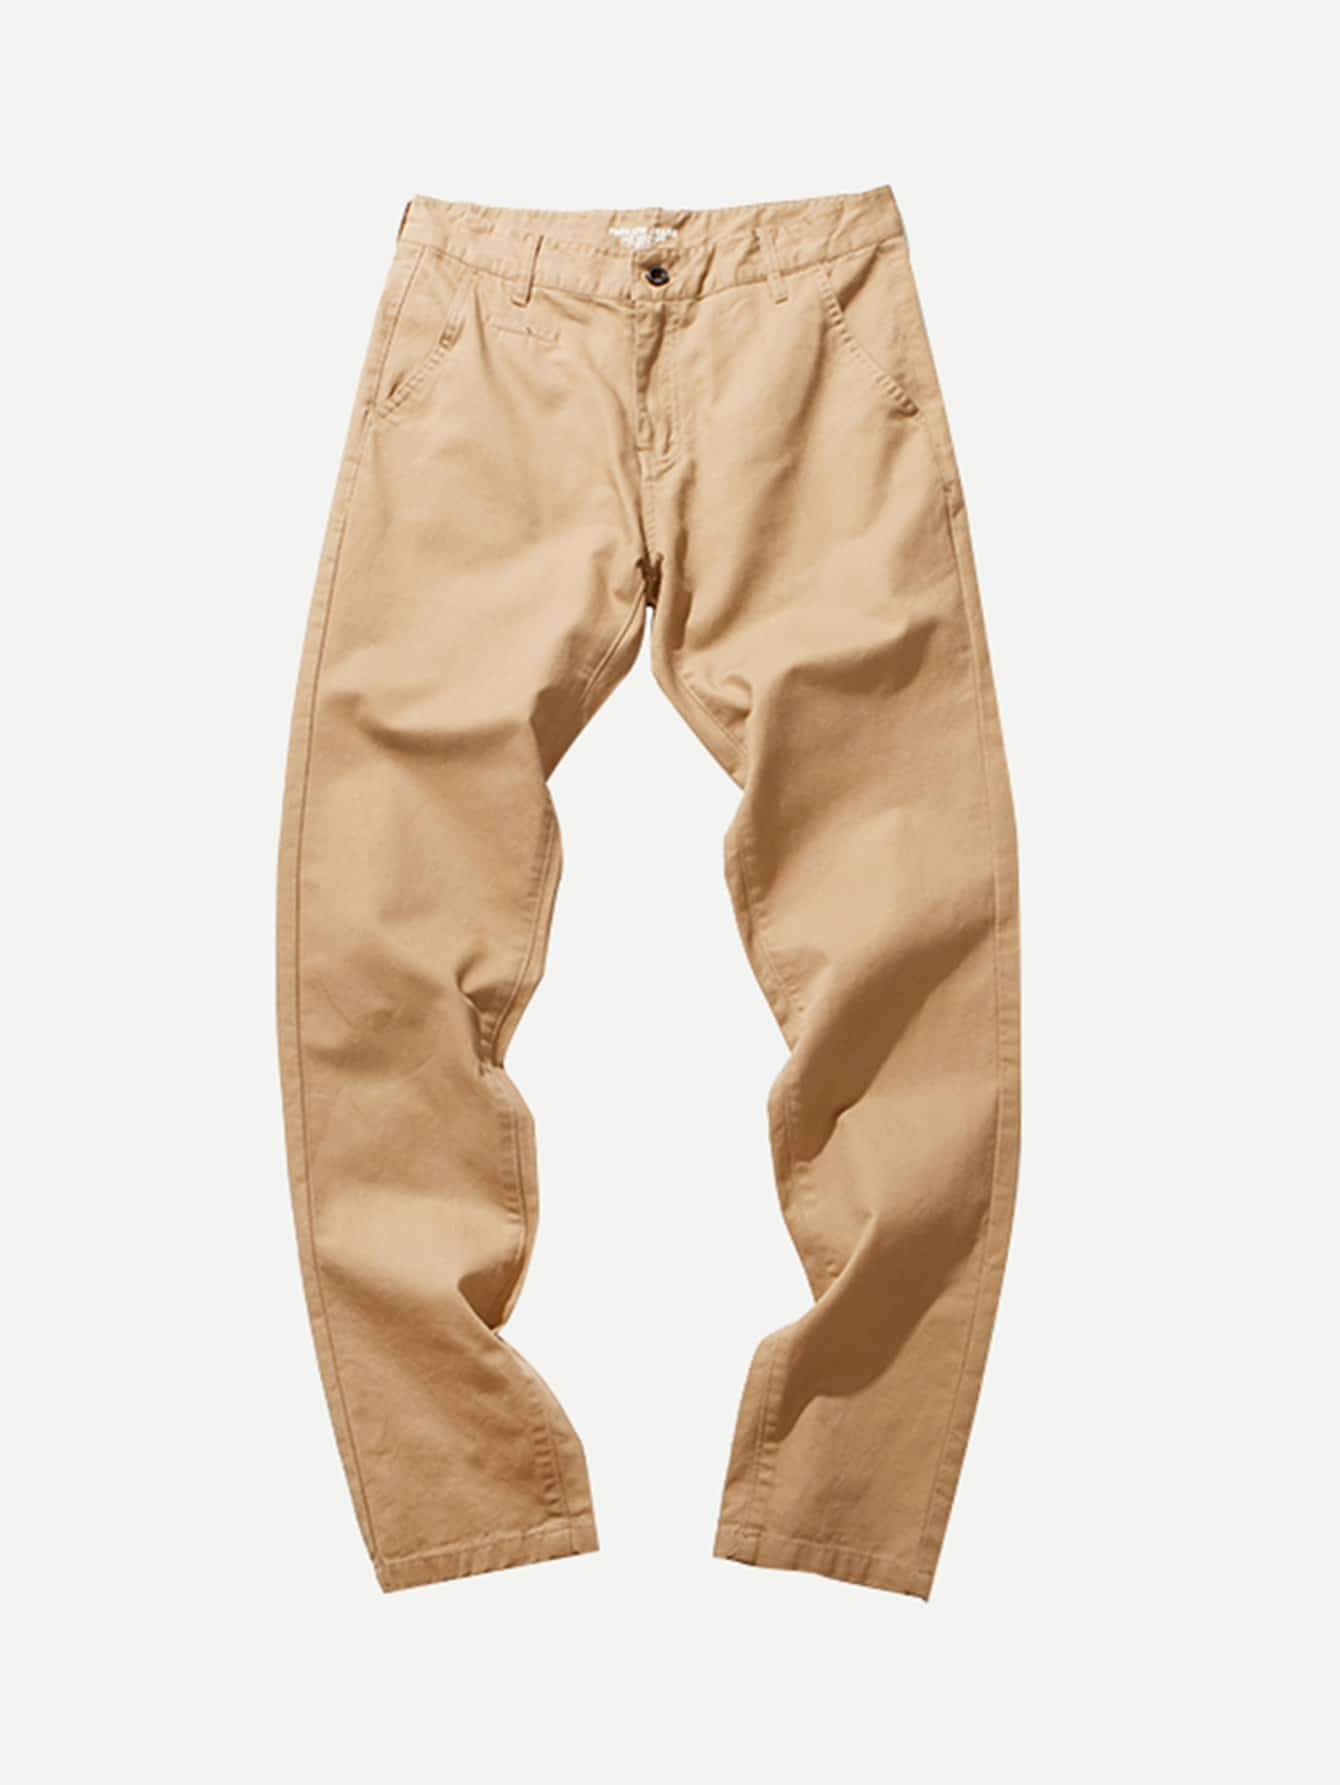 Men Cut And Sew Panel Pants